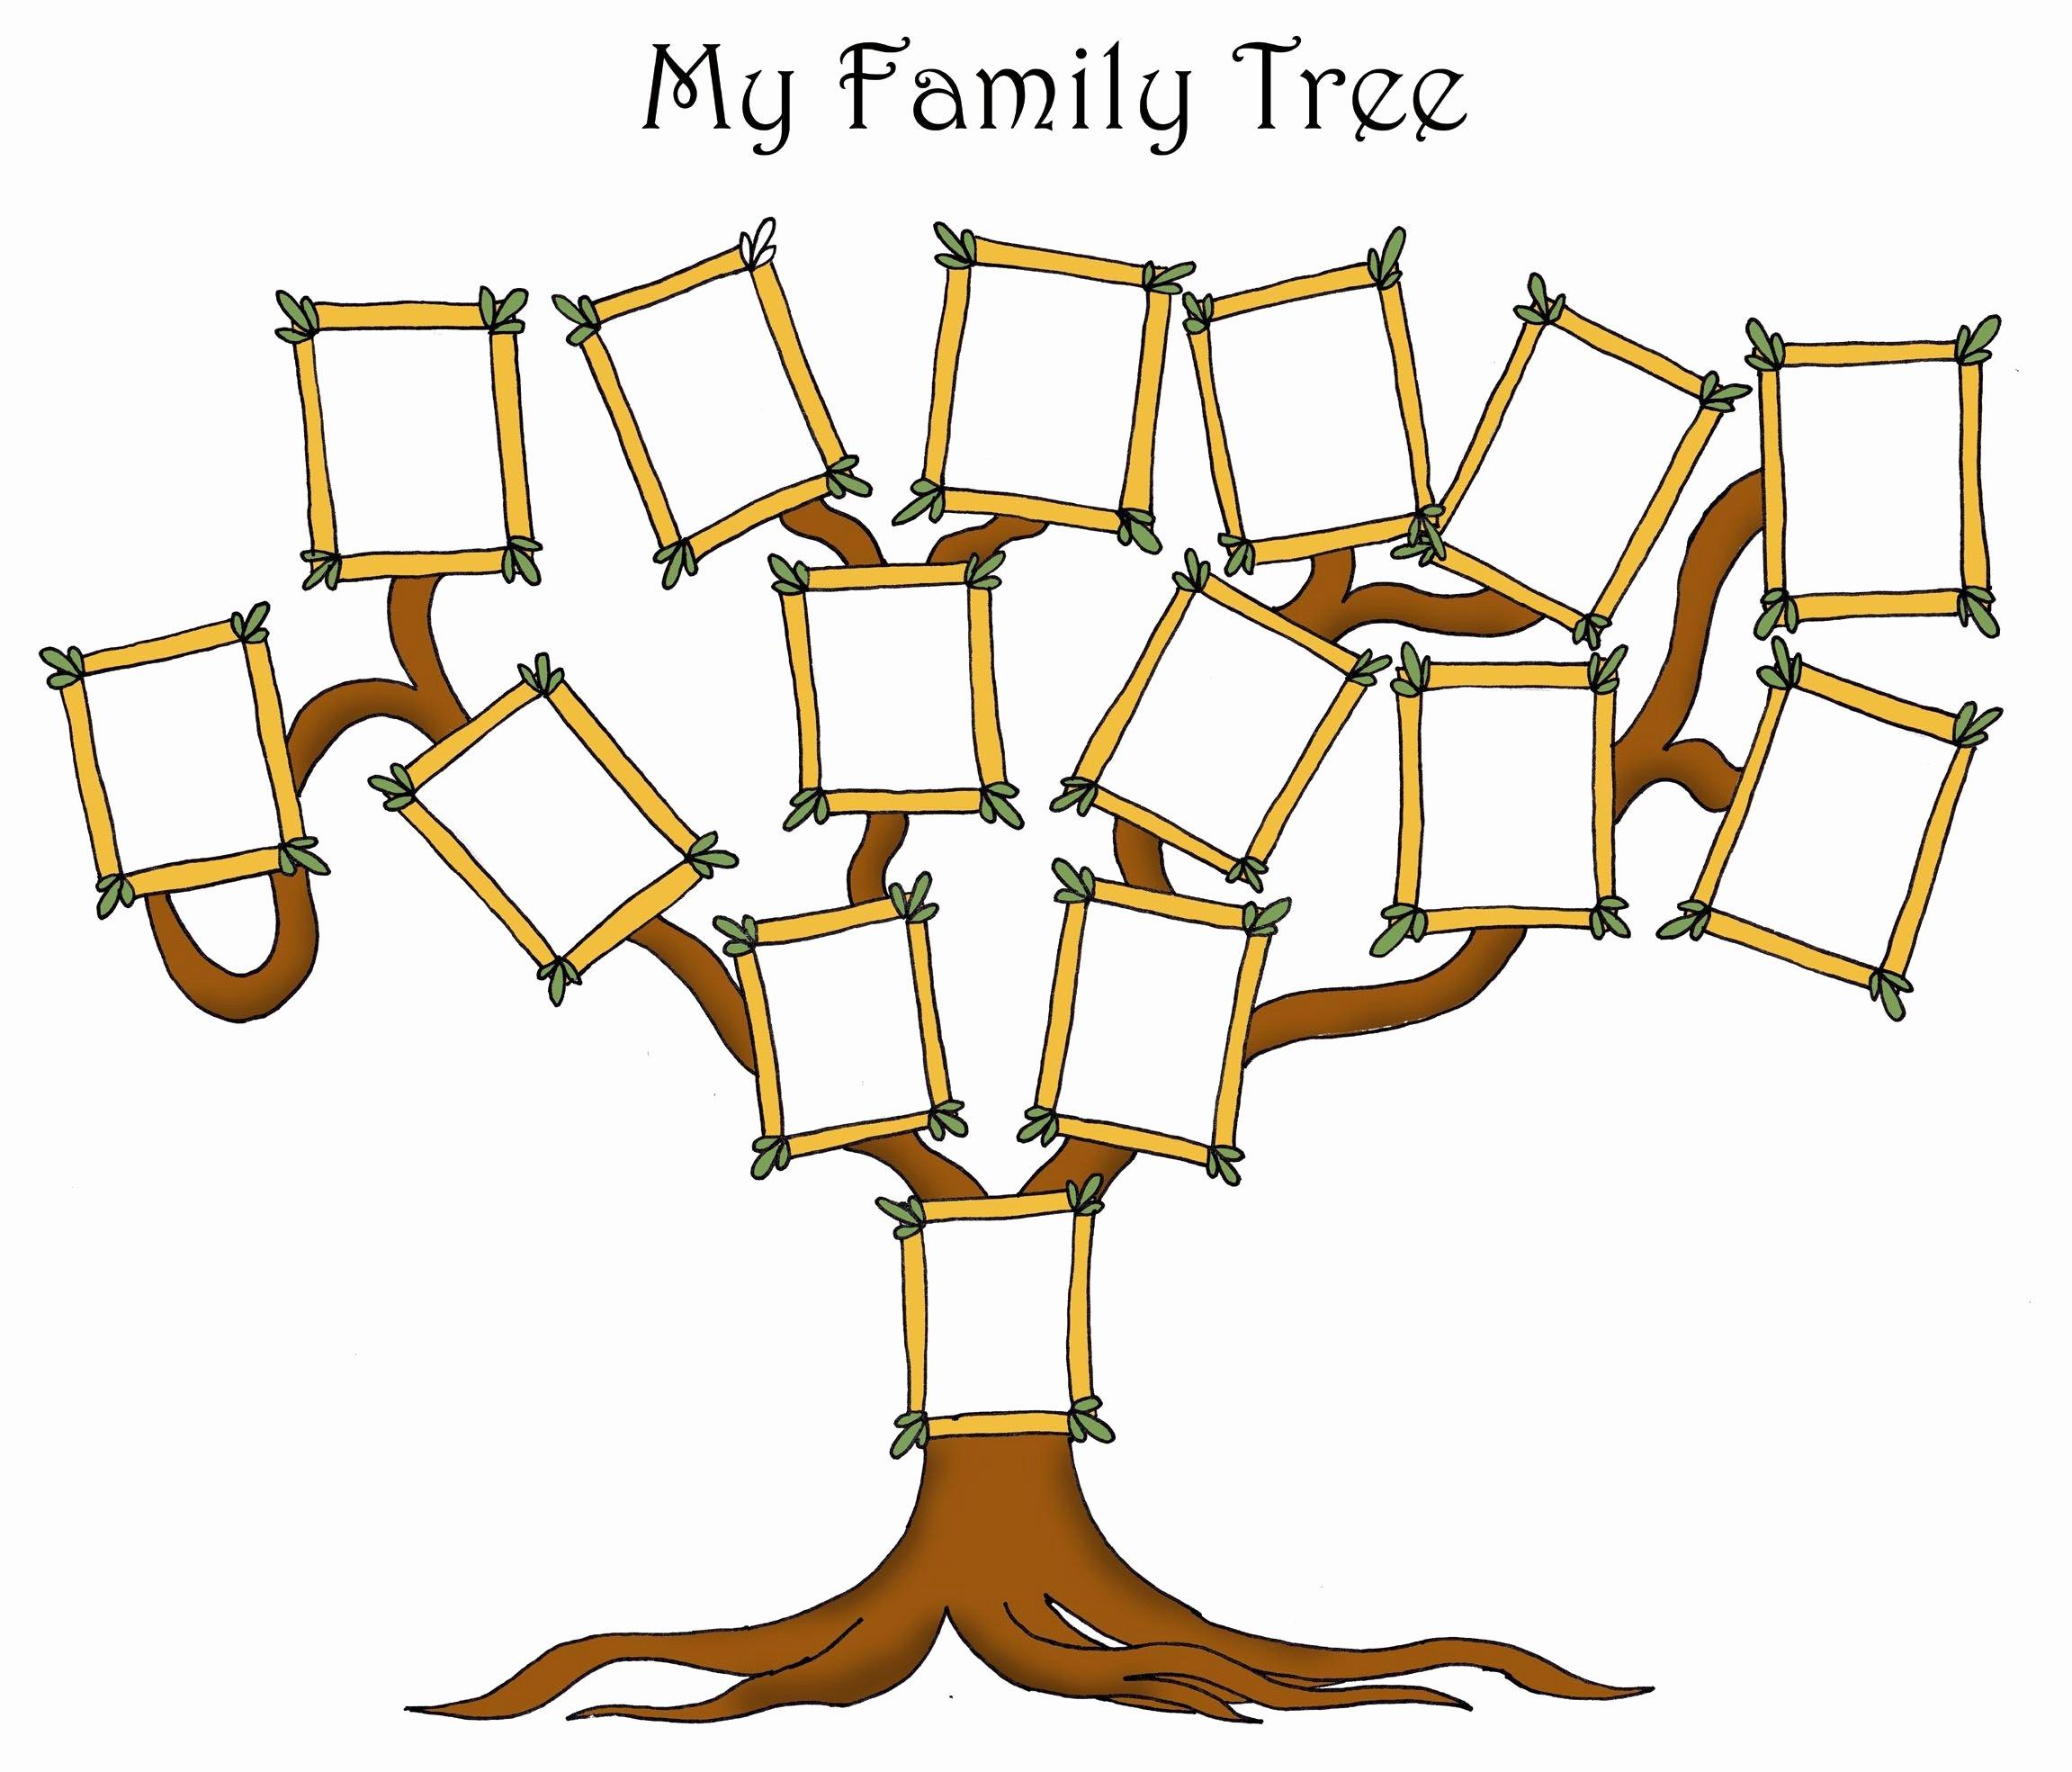 Free Family Tree Templates New Free Editable Family Tree Template Daily Roabox